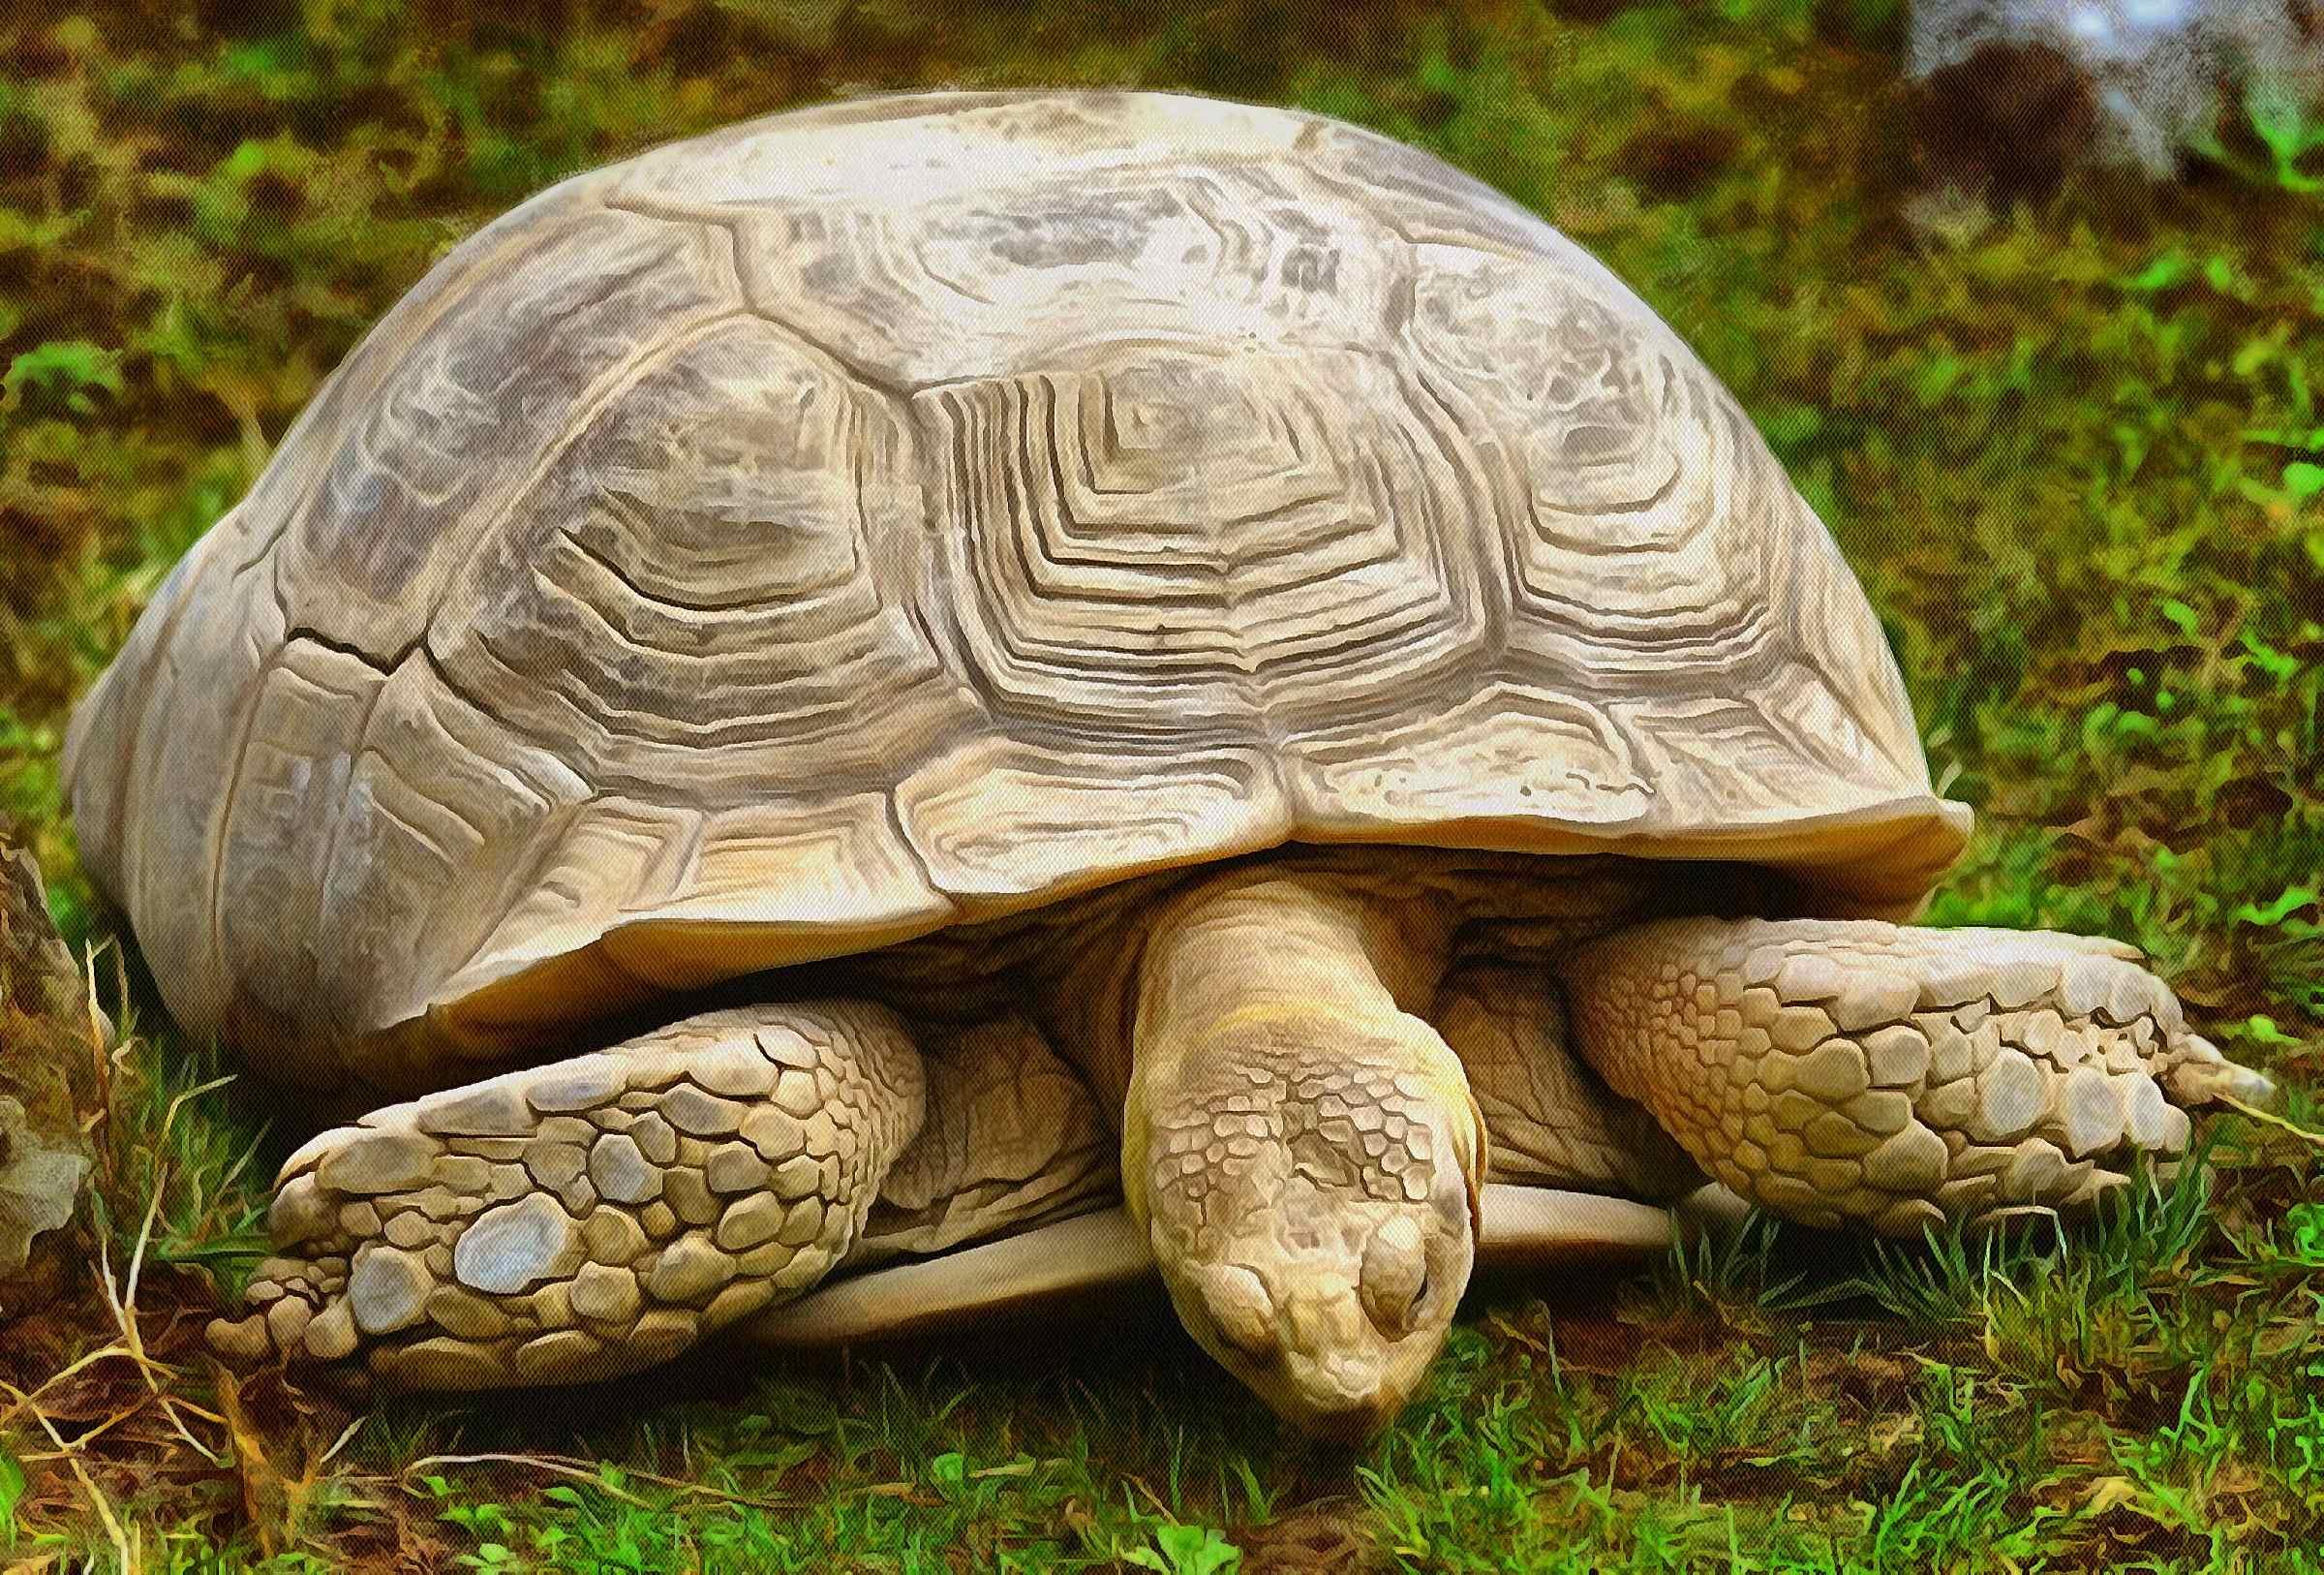 Free Tortoise images, Turtle free images,  –  Turtle stock free images, free images turtles, tortoise public domain images, Turtle public domain images, Tortoise free ,!